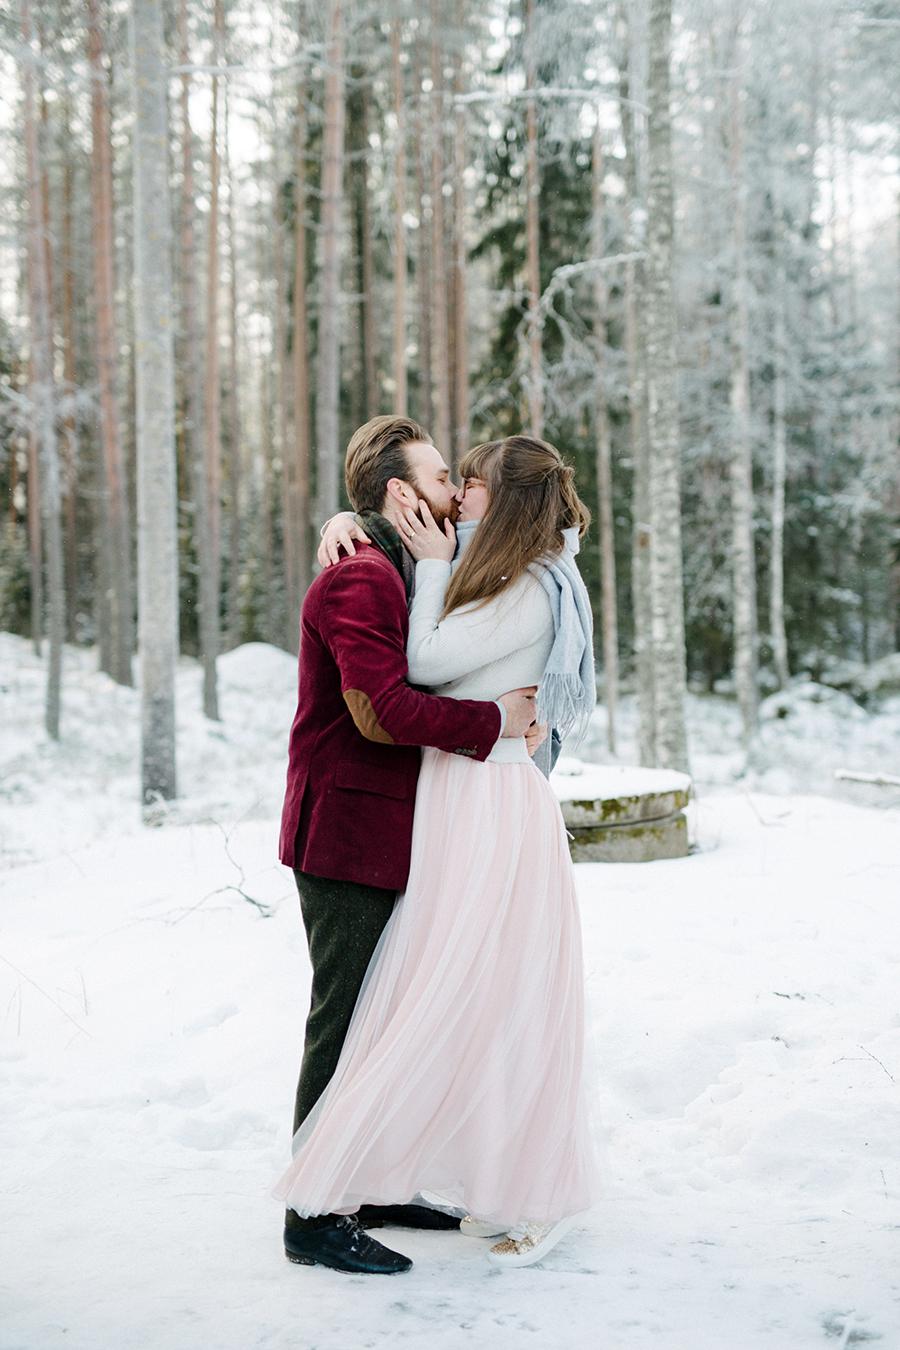 Romany & Juho's Surprise Winter Wedding at Evon Luonto